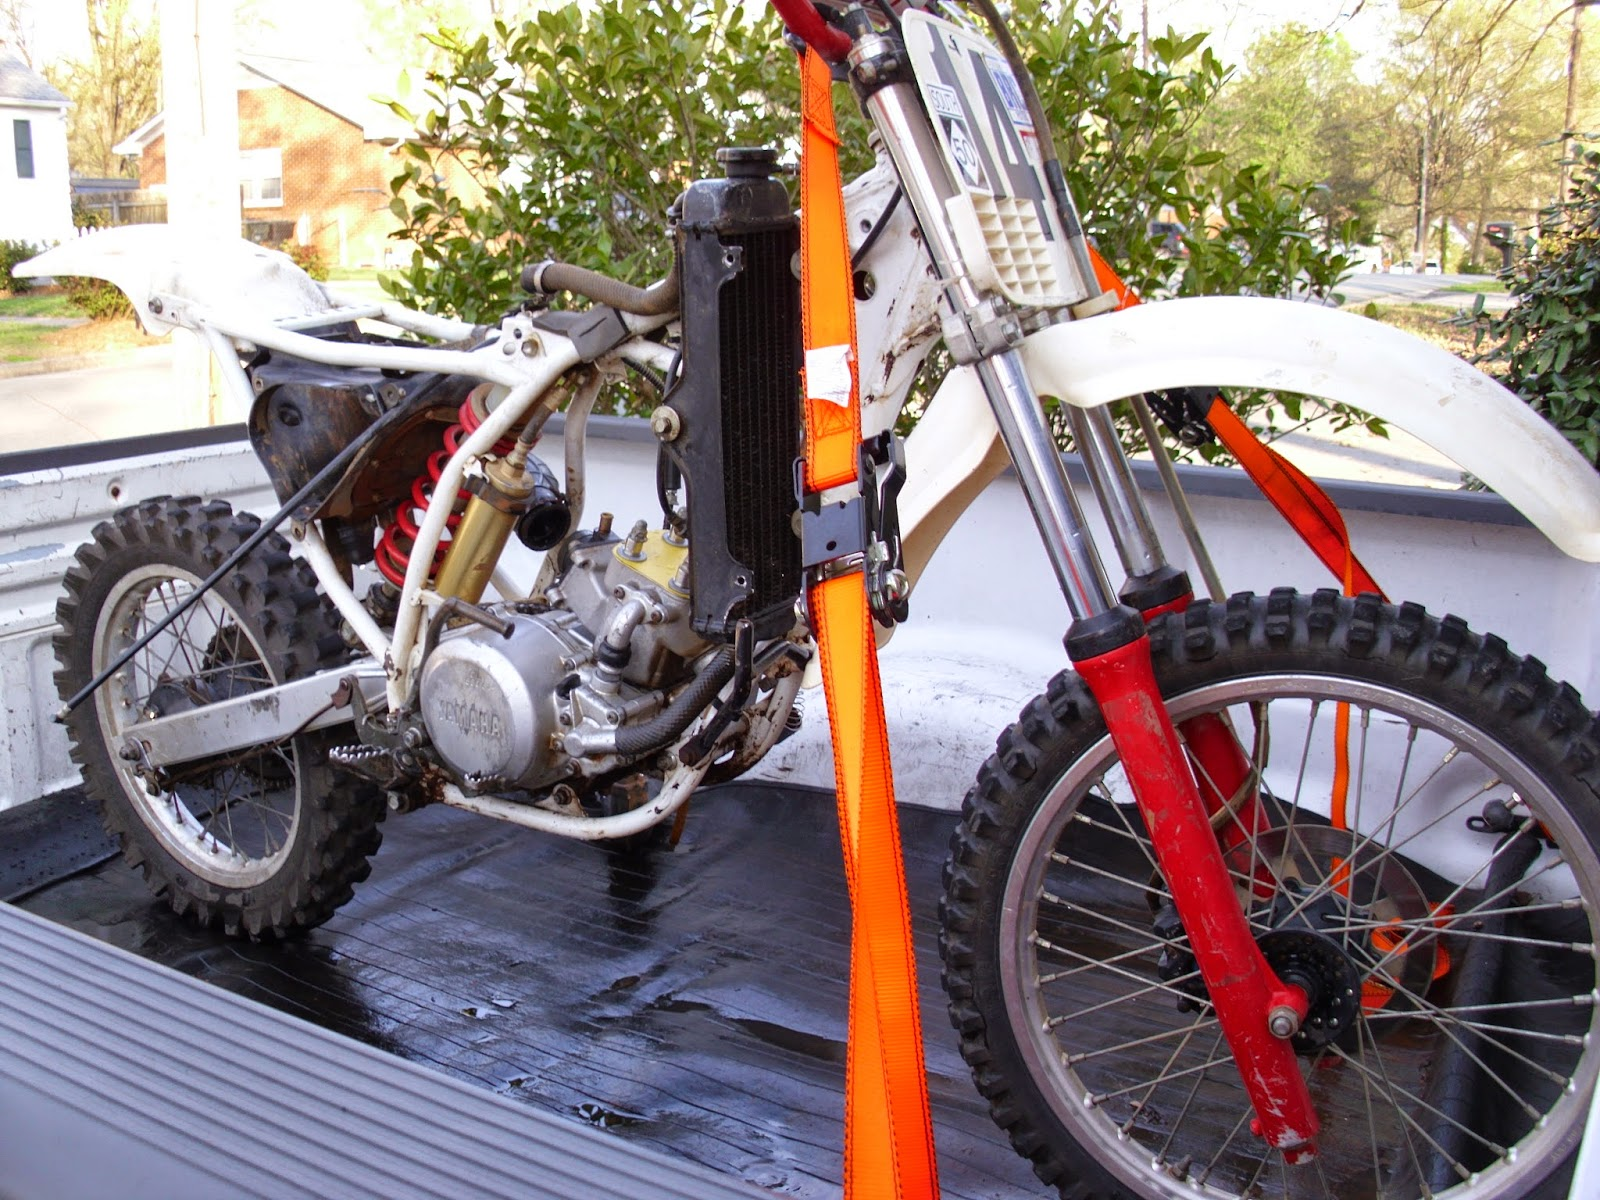 Motorcycle Renew Project Yz80 Restoration